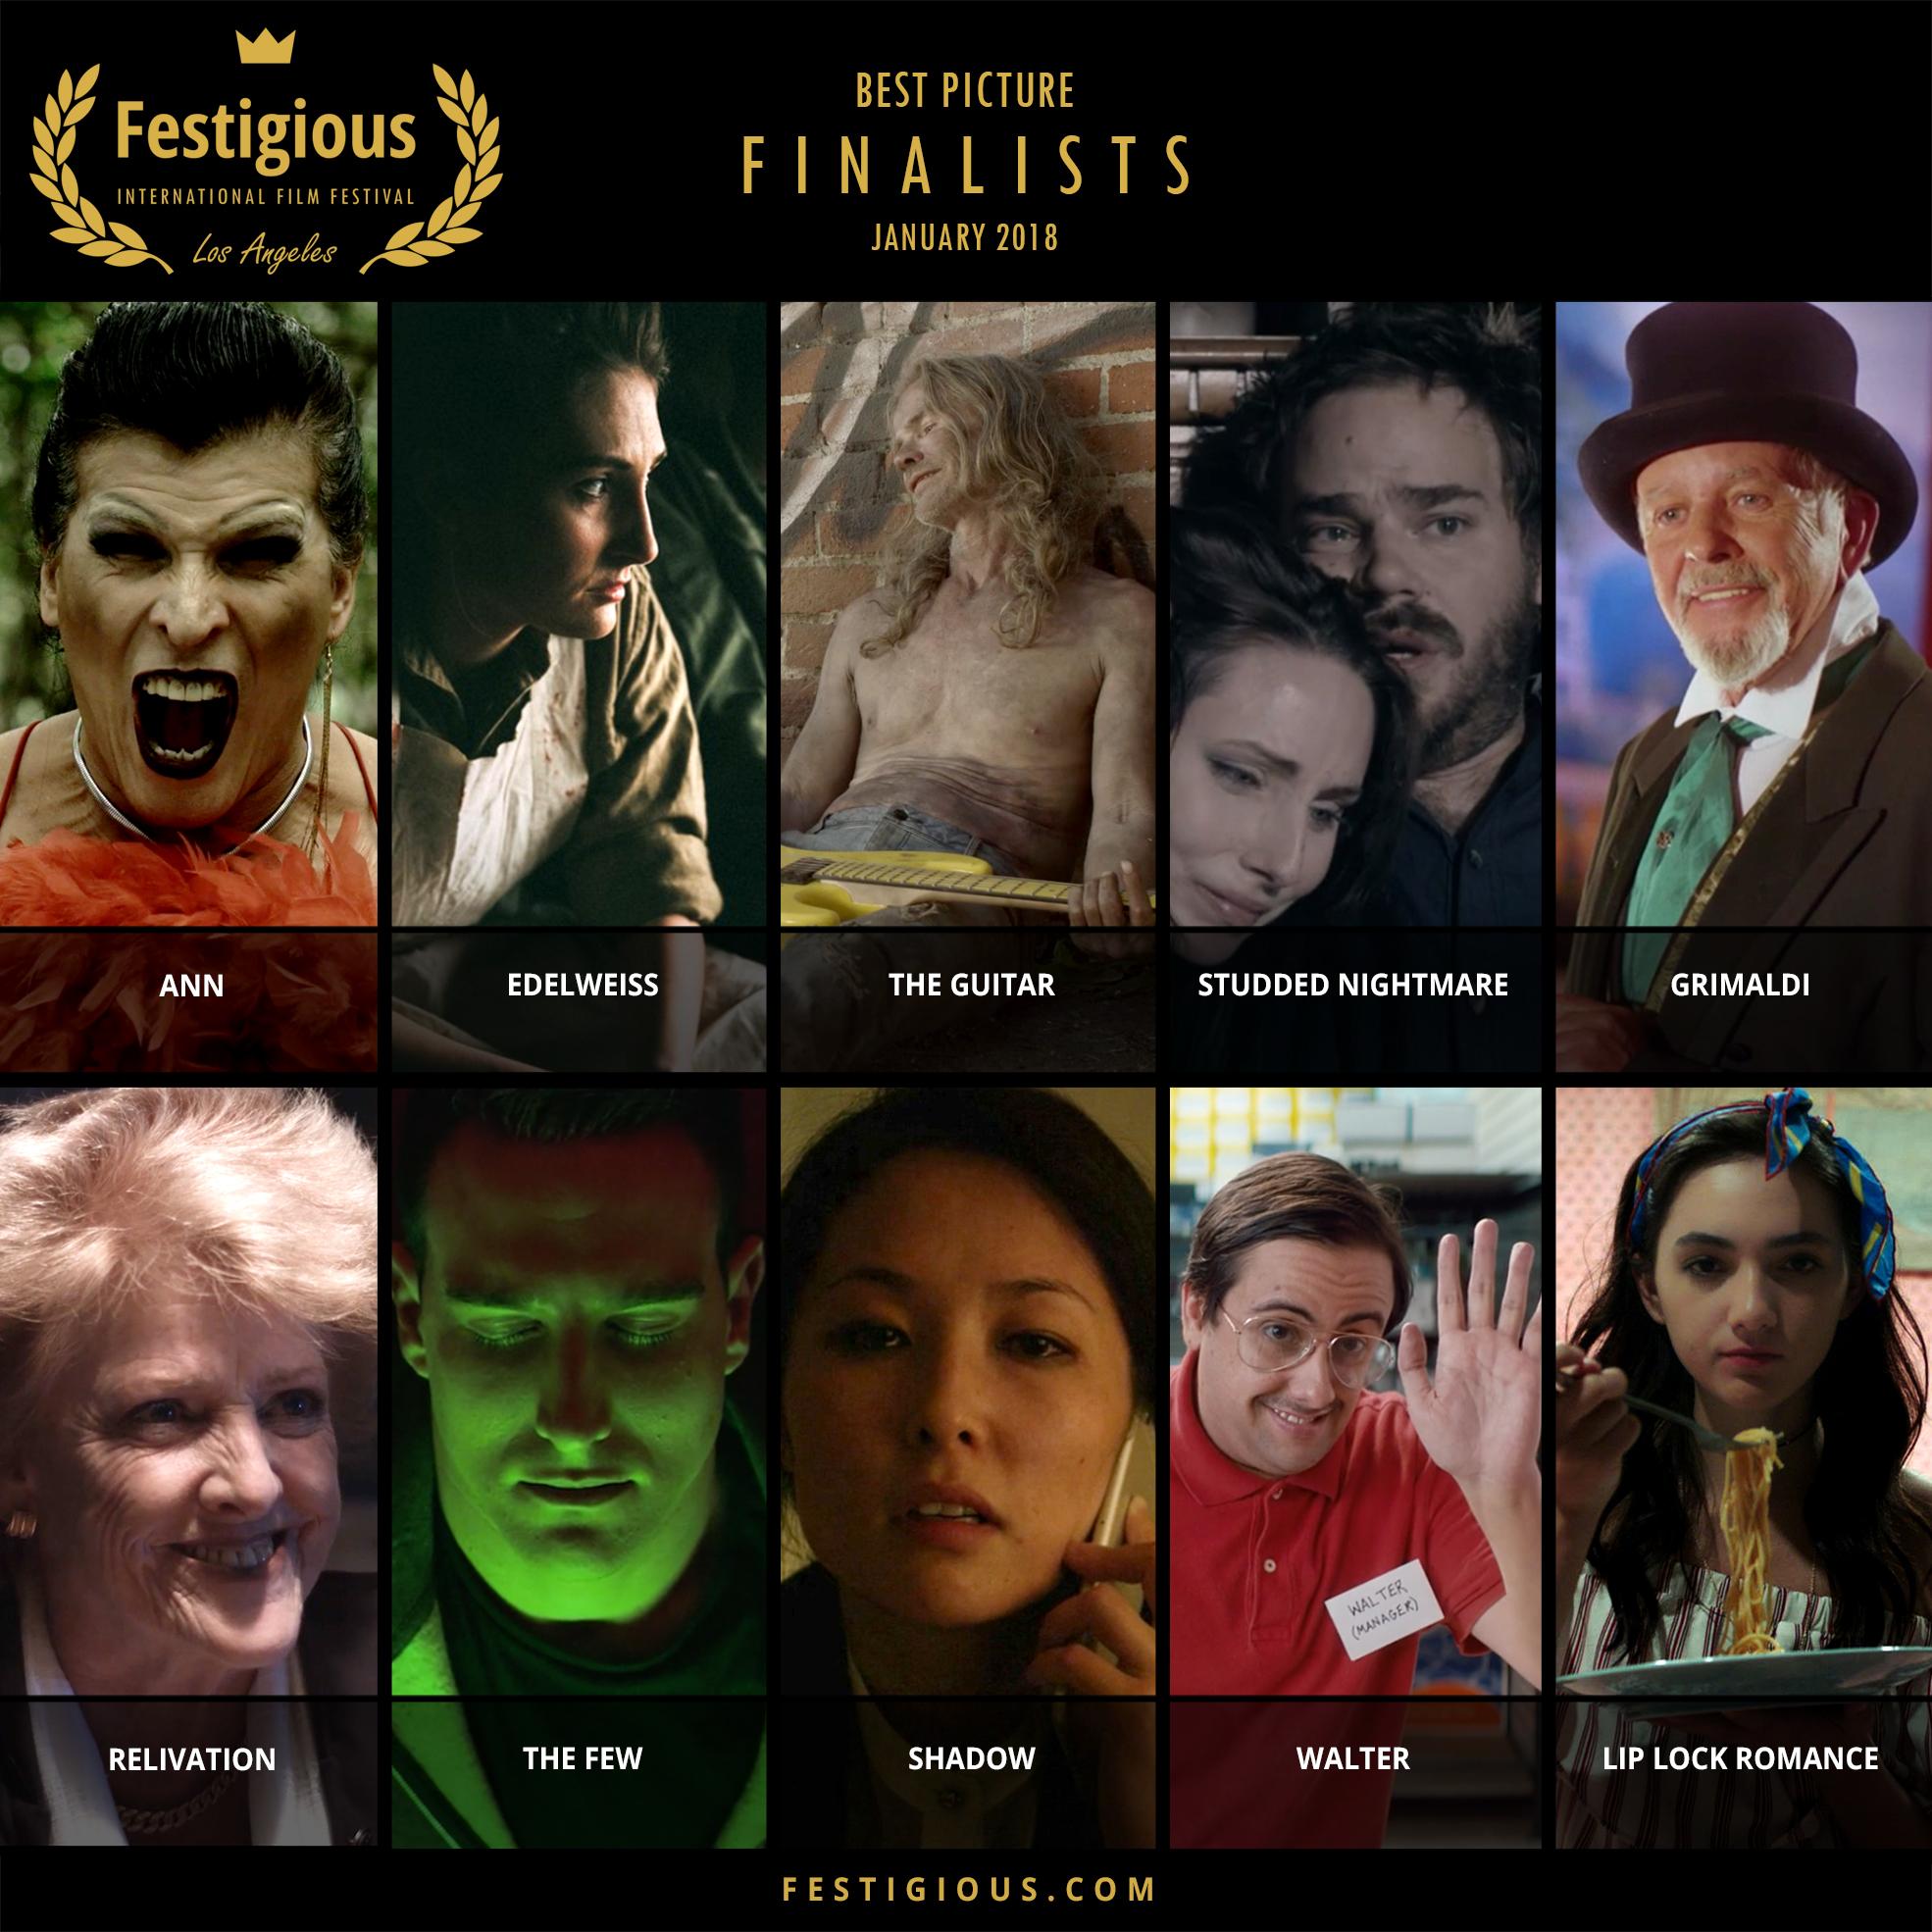 FESTIGIOUS FINALISTS 2018 01